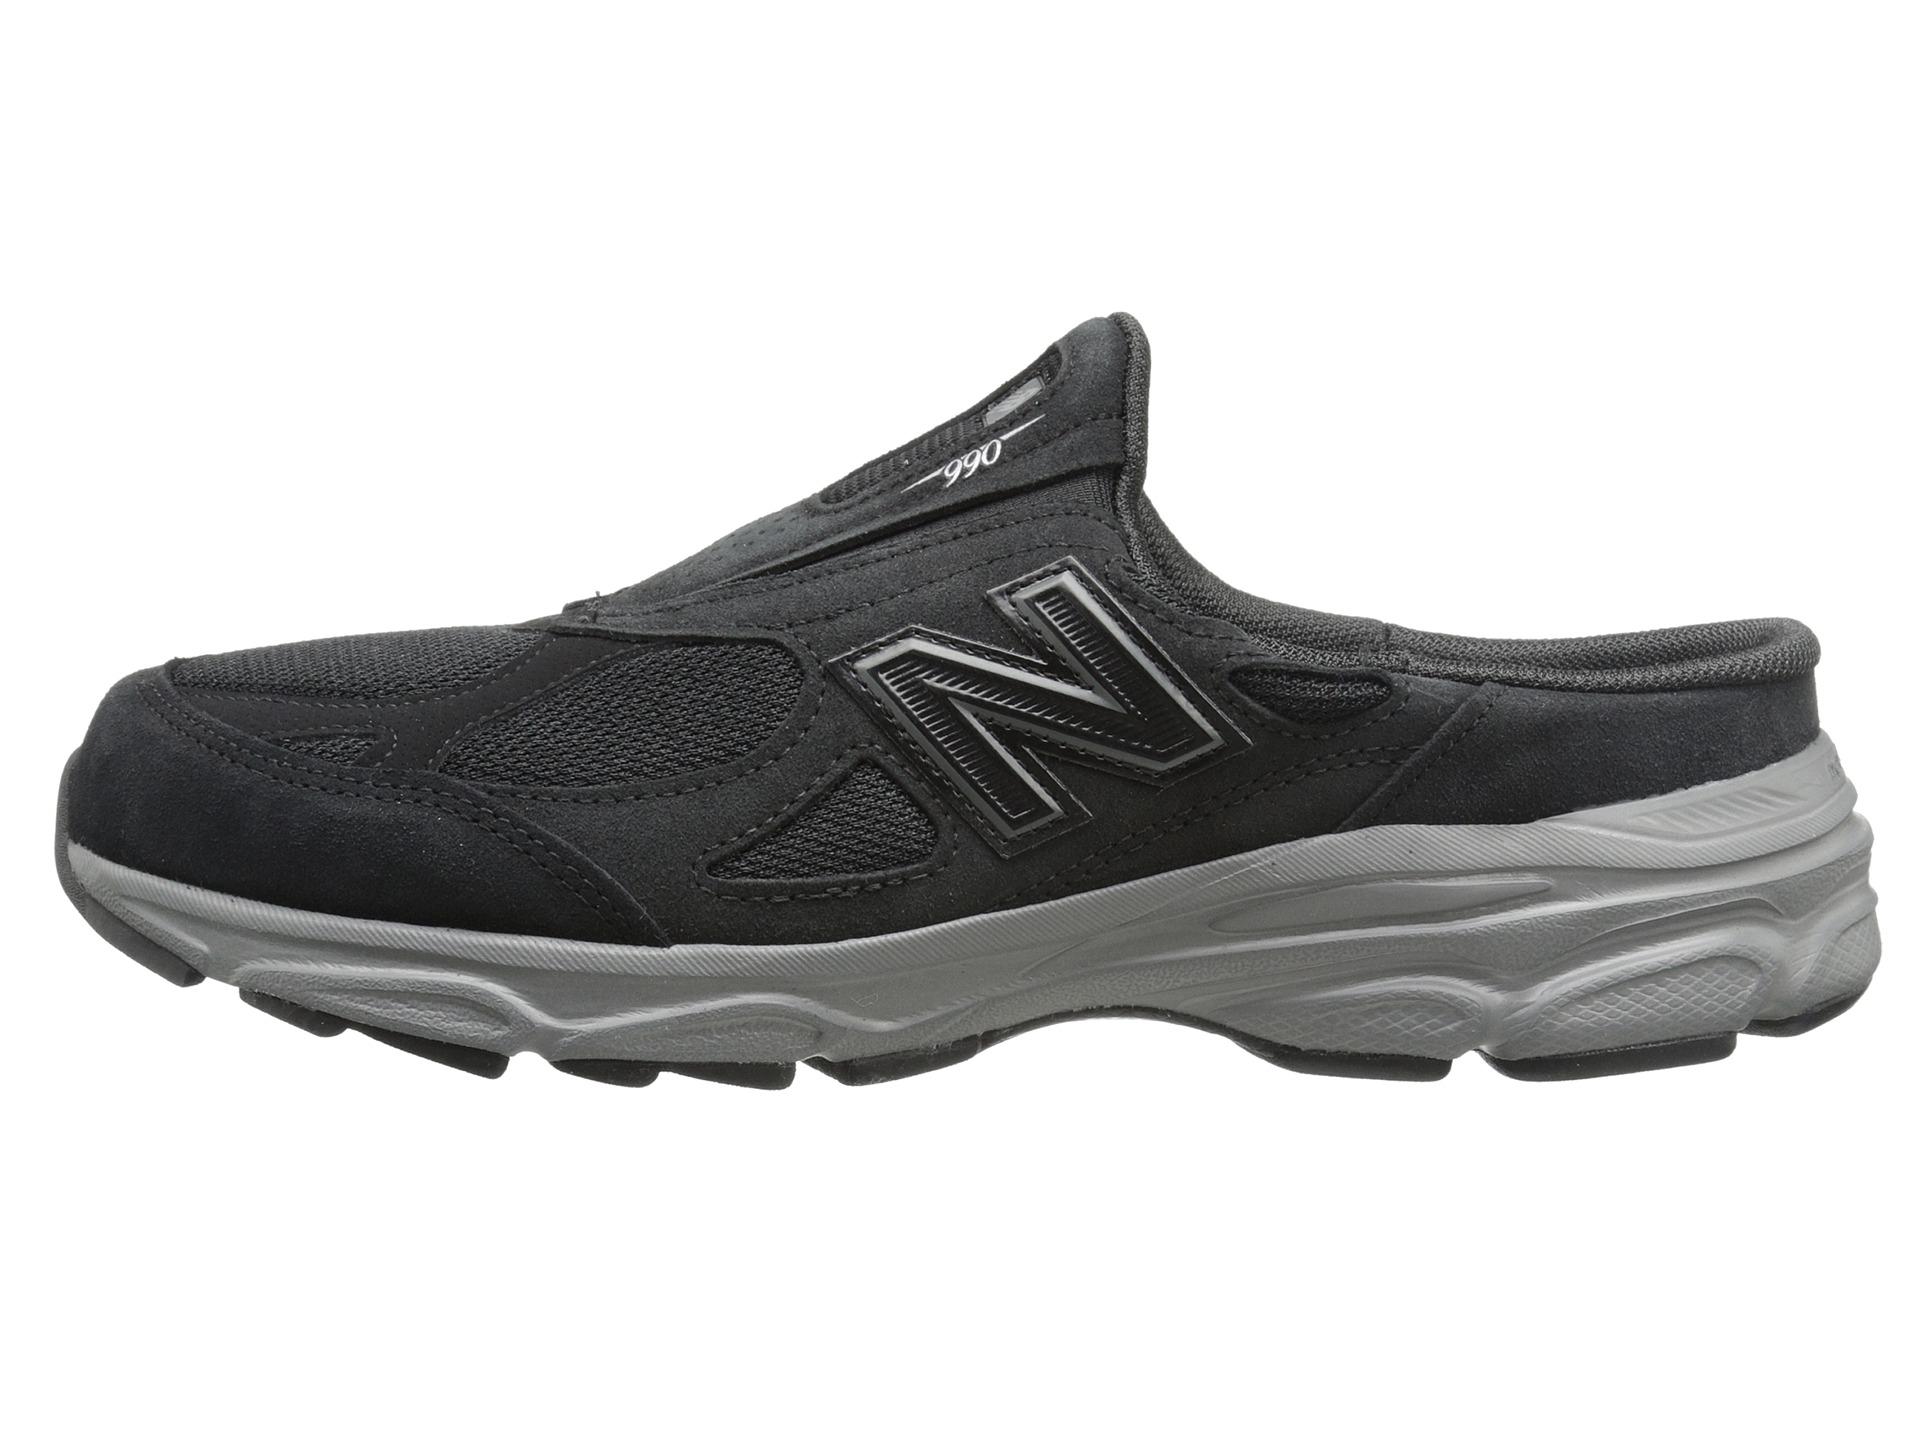 Lyst New Balance M990v3 Slip On In Black